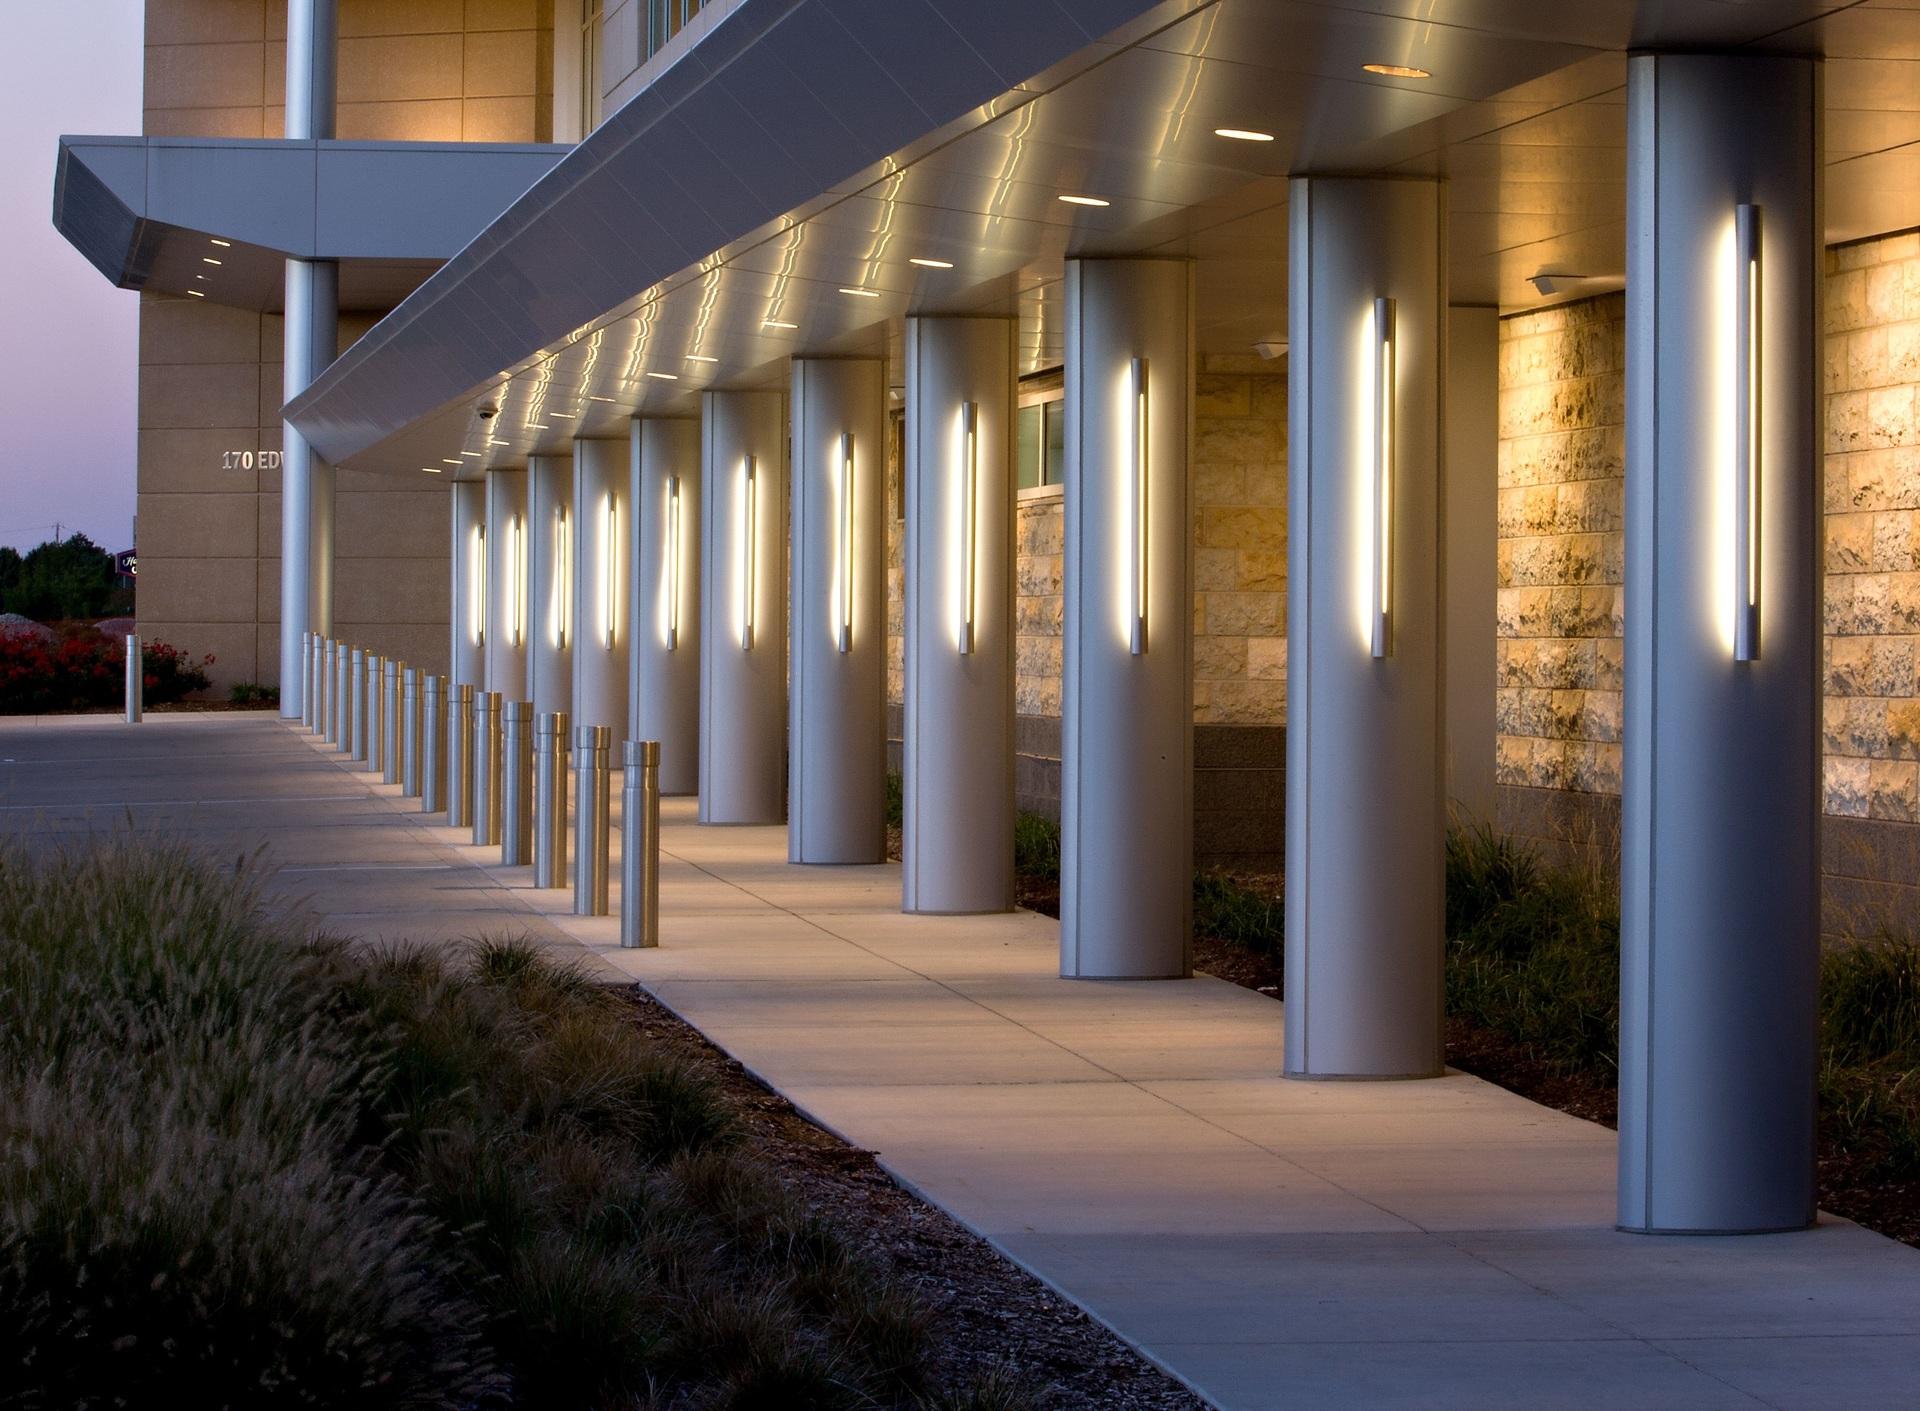 ocl architectural lighting armet